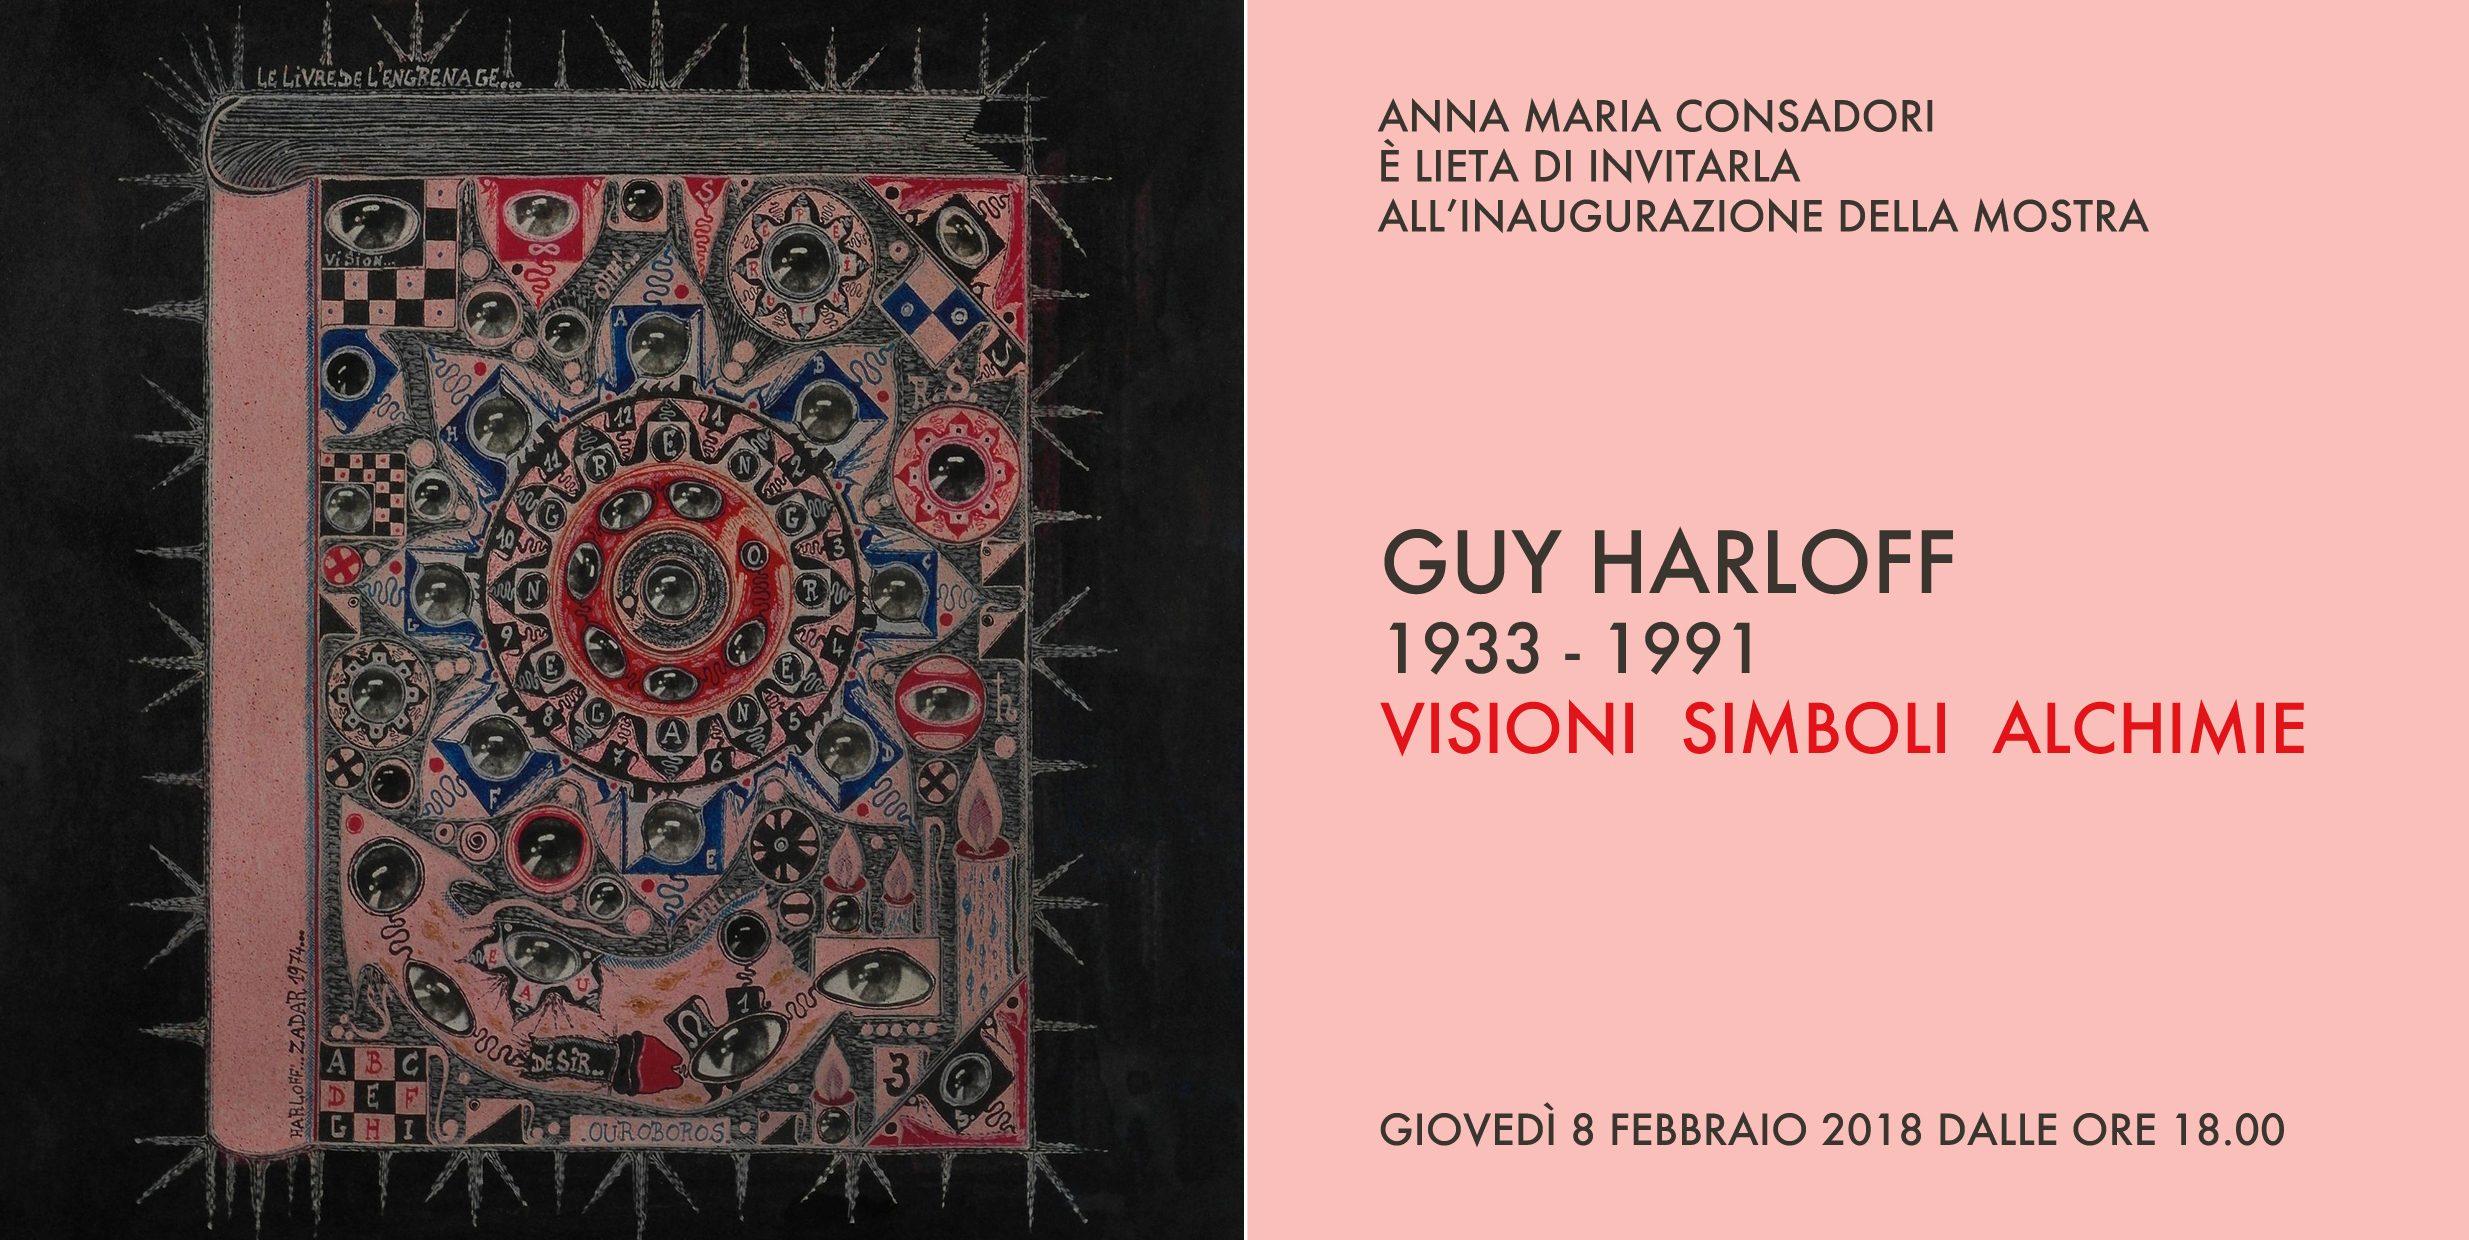 Harloff invitation - Visions symbols alchemies